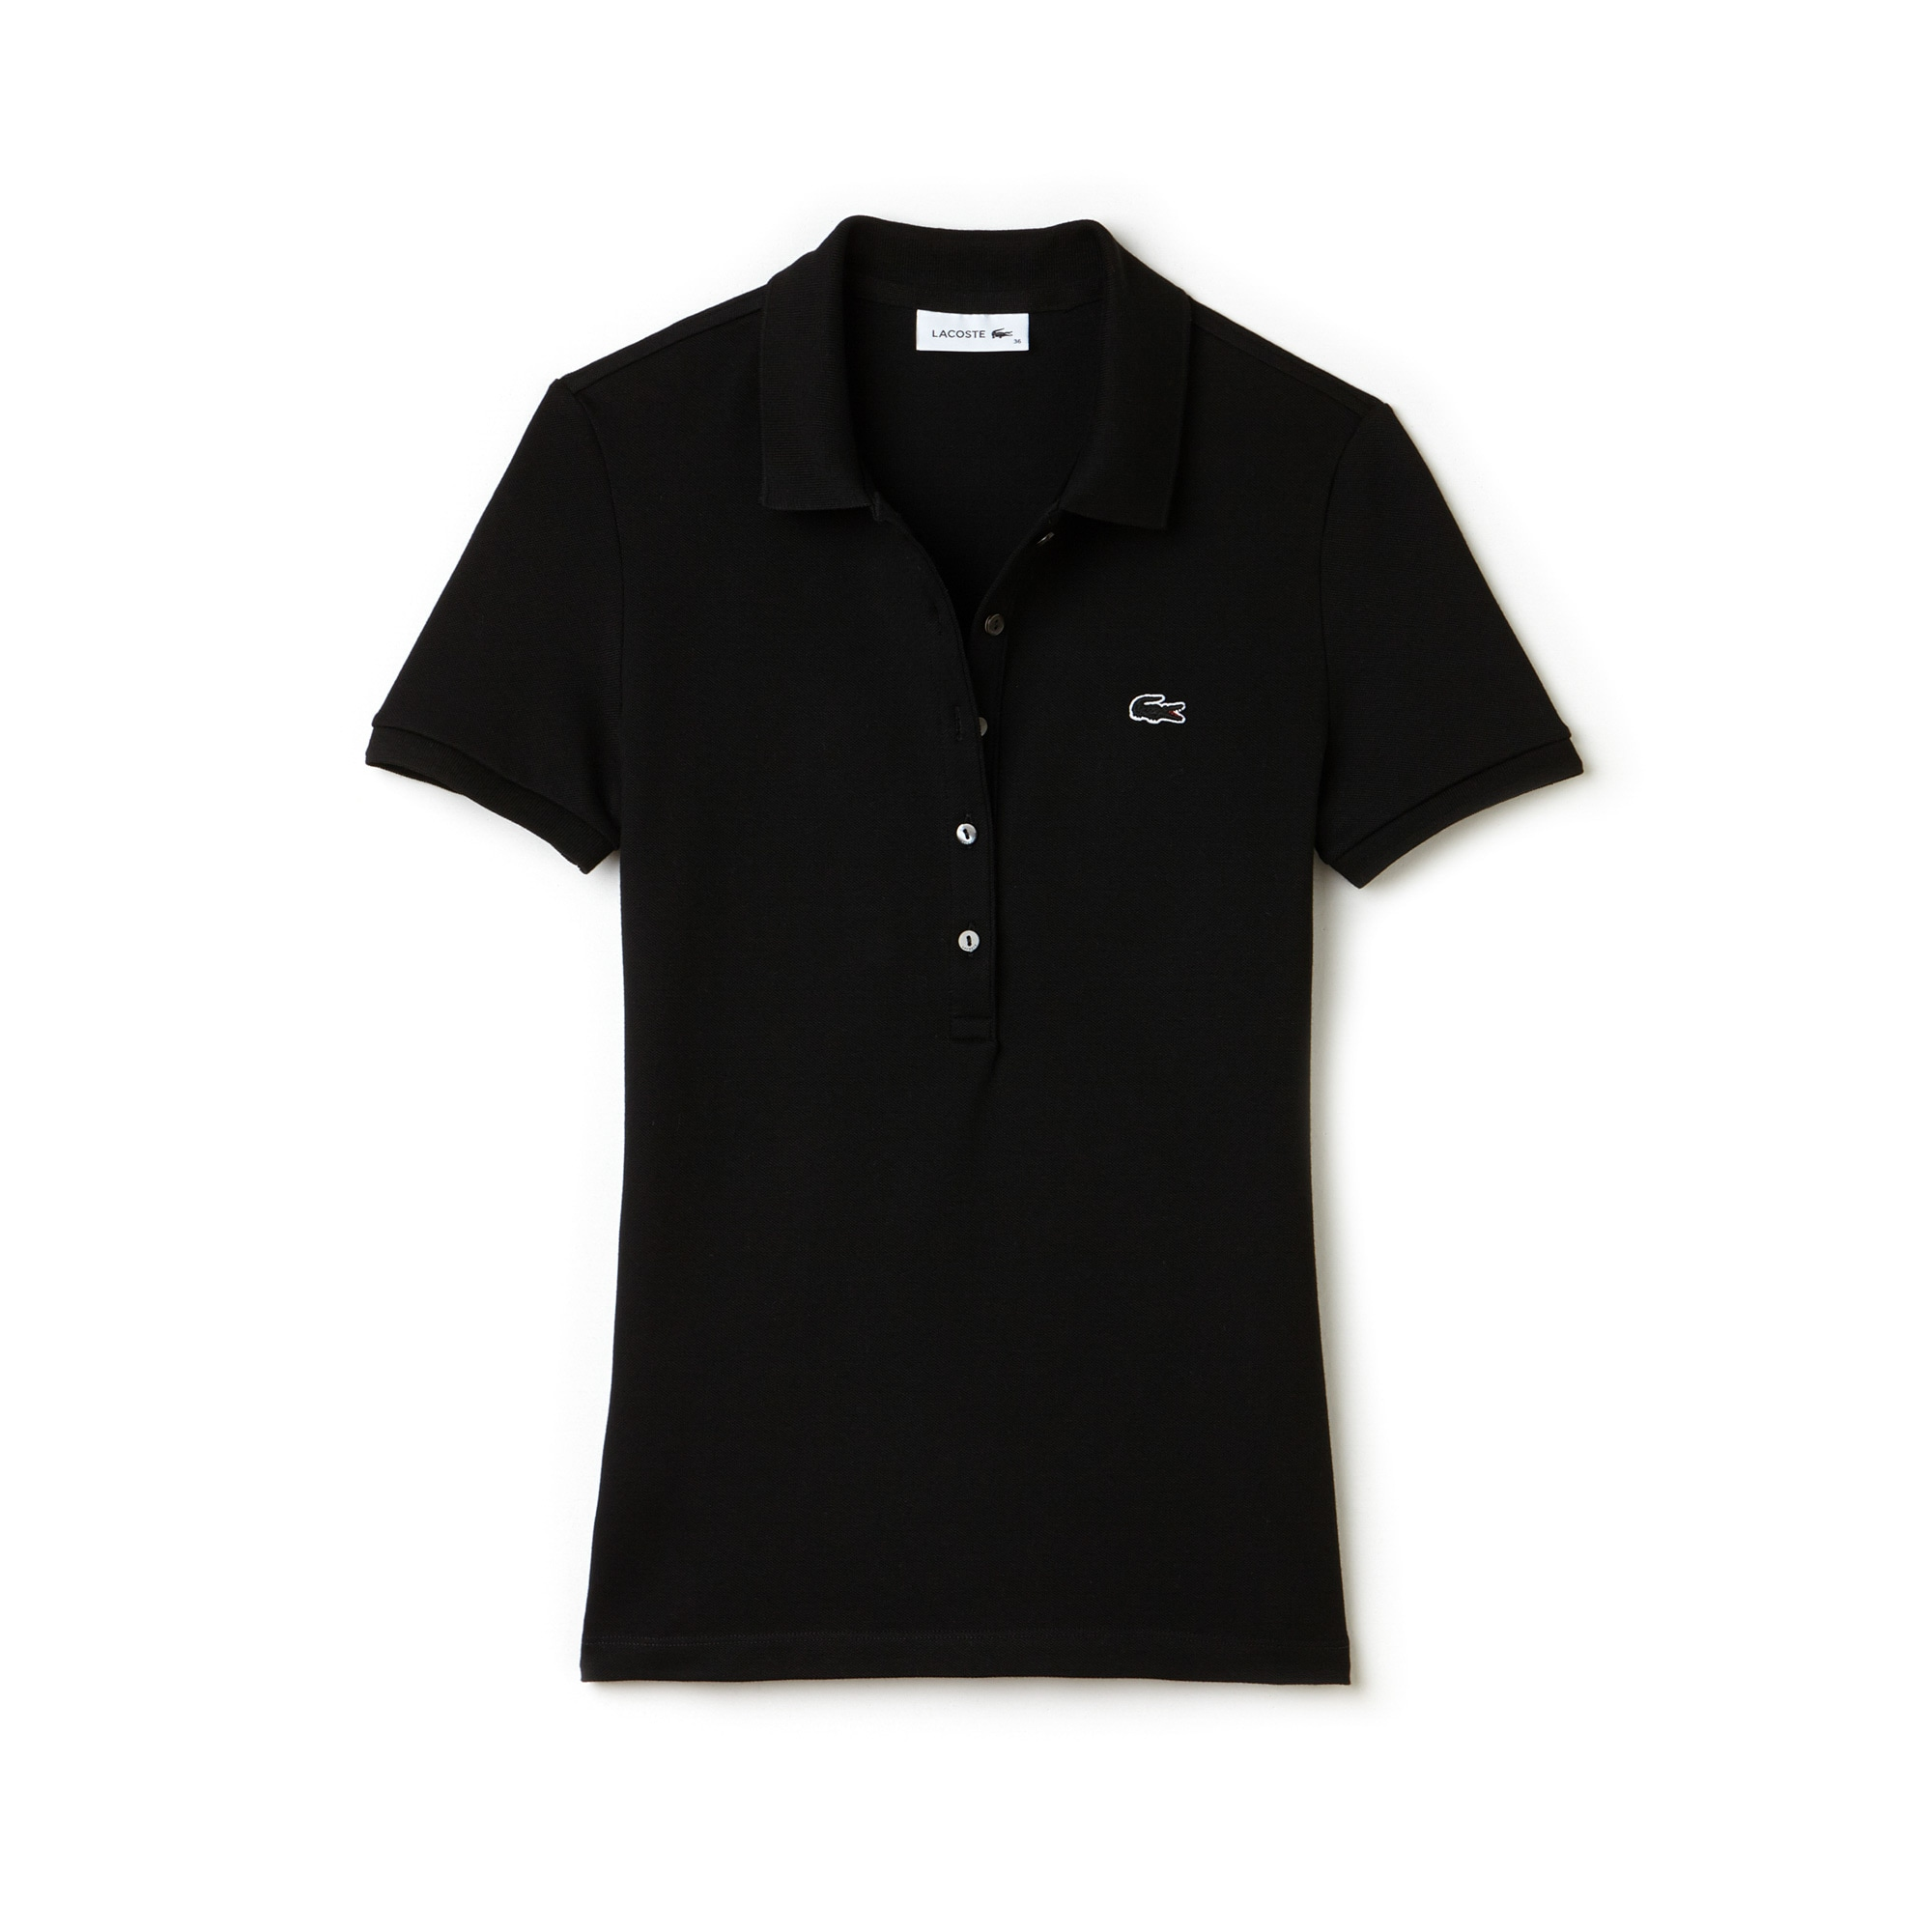 77c7eb0416 Women's Slim Fit Stretch Mini Cotton Piqué Polo Shirt